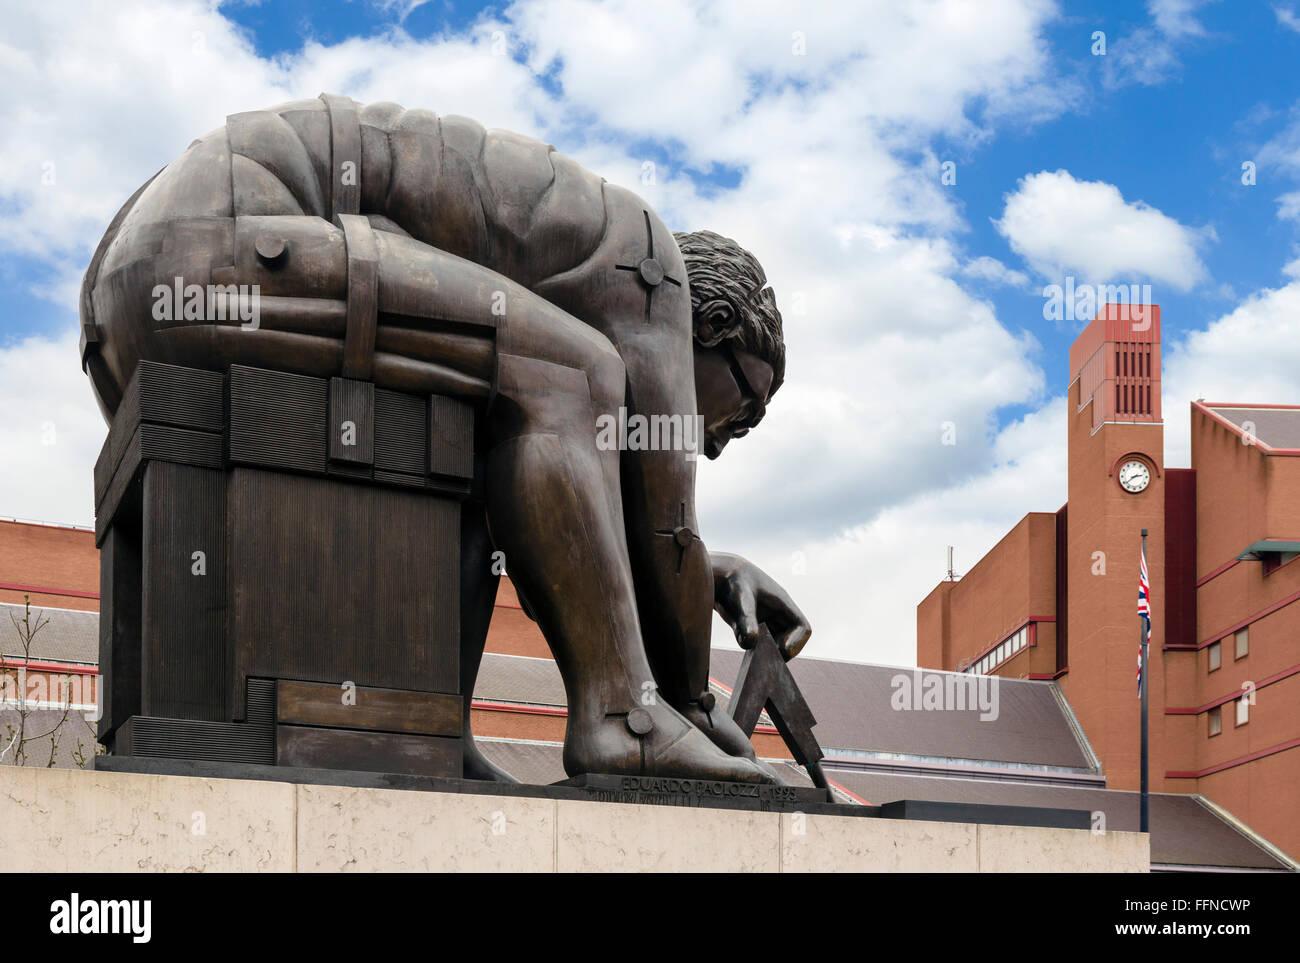 Eduardo Paolozzi's statue 'Newton' outside the British Library, London, England, UK - Stock Image